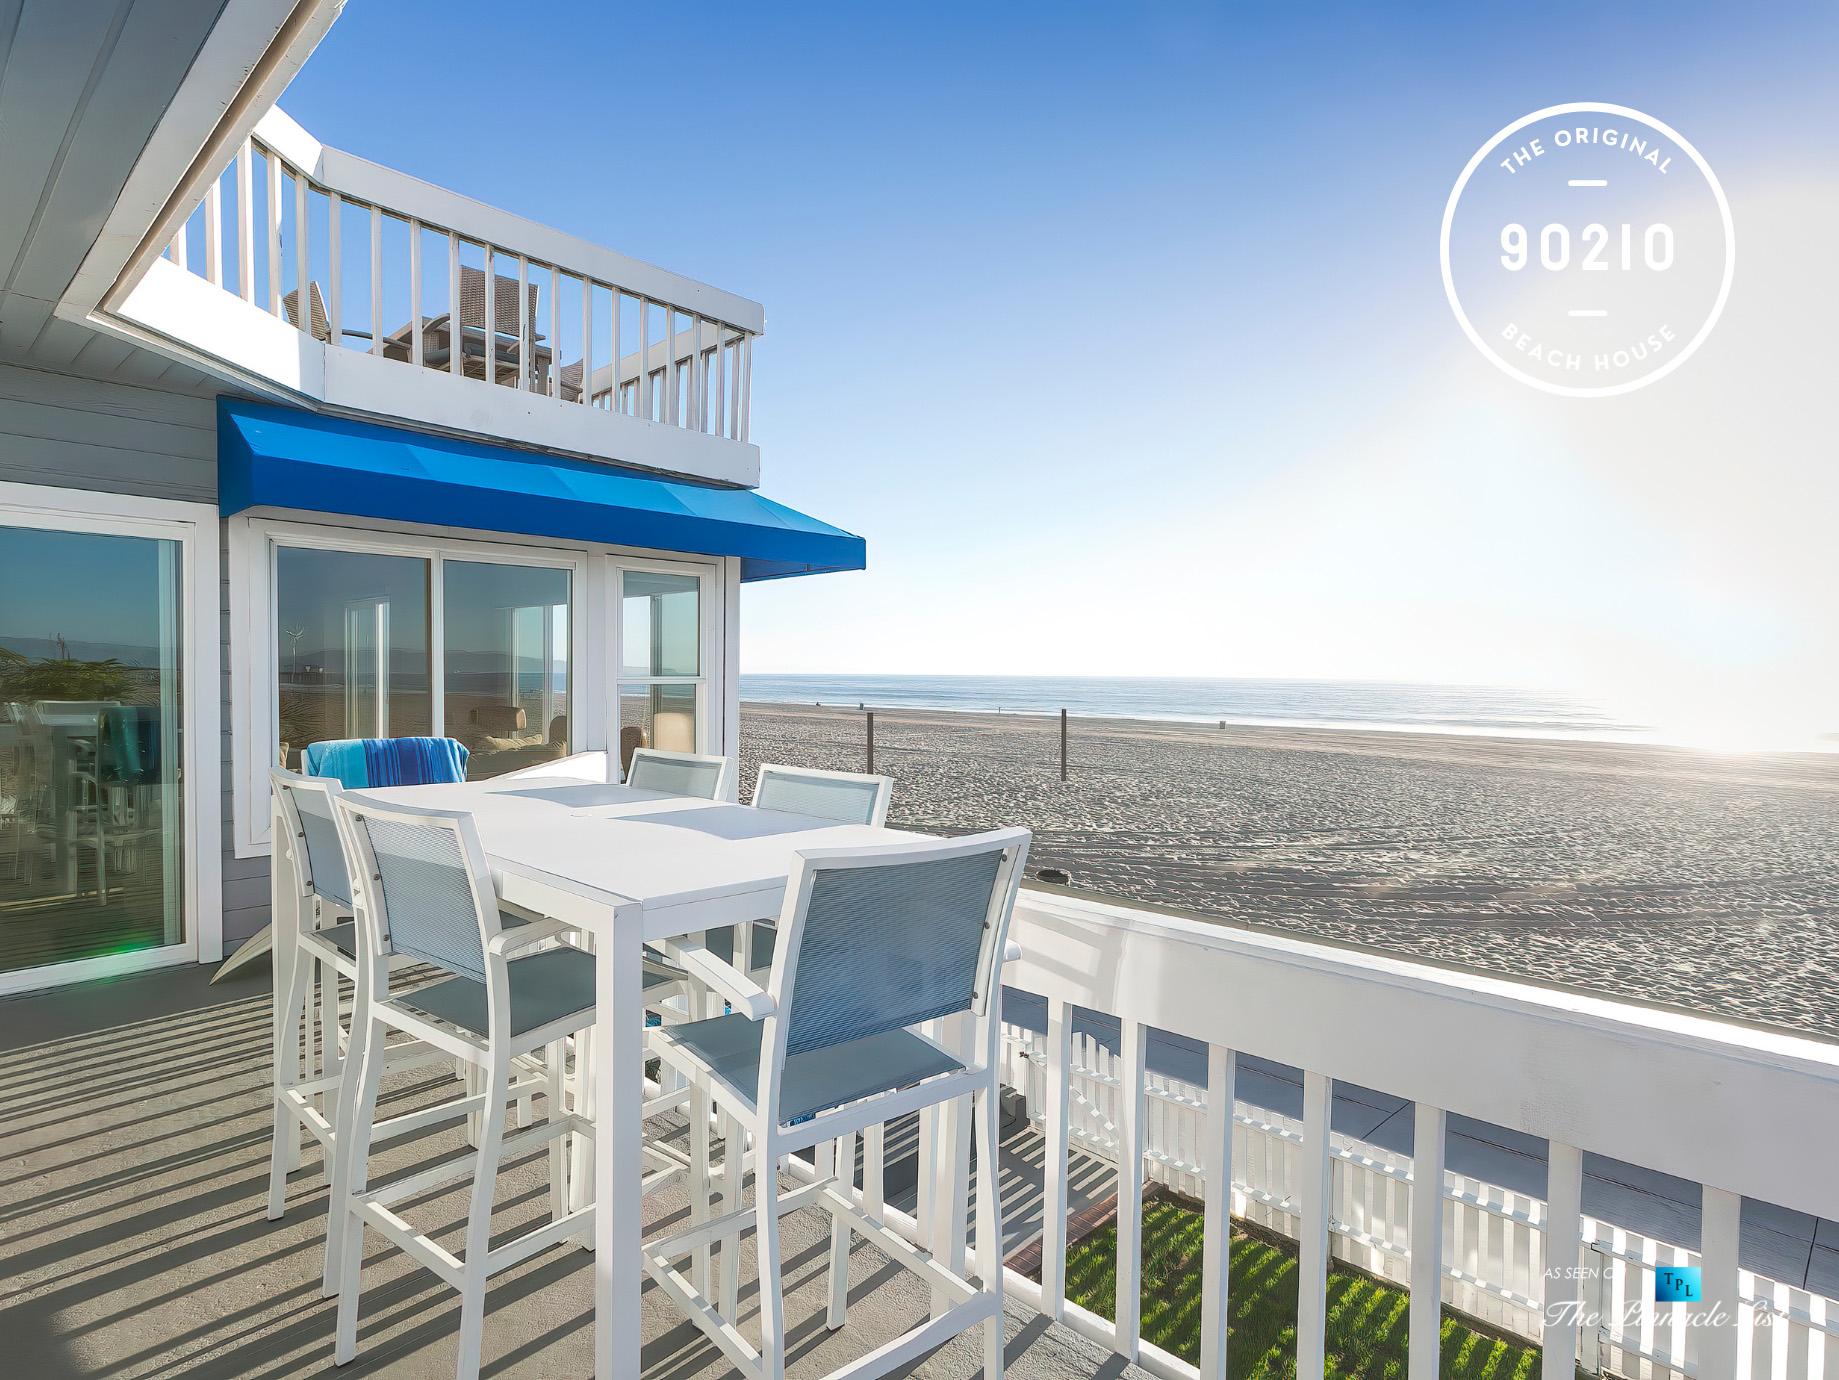 The Original 90210 Beach House – 3500 The Strand, Hermosa Beach, CA, USA – Ocean View Deck